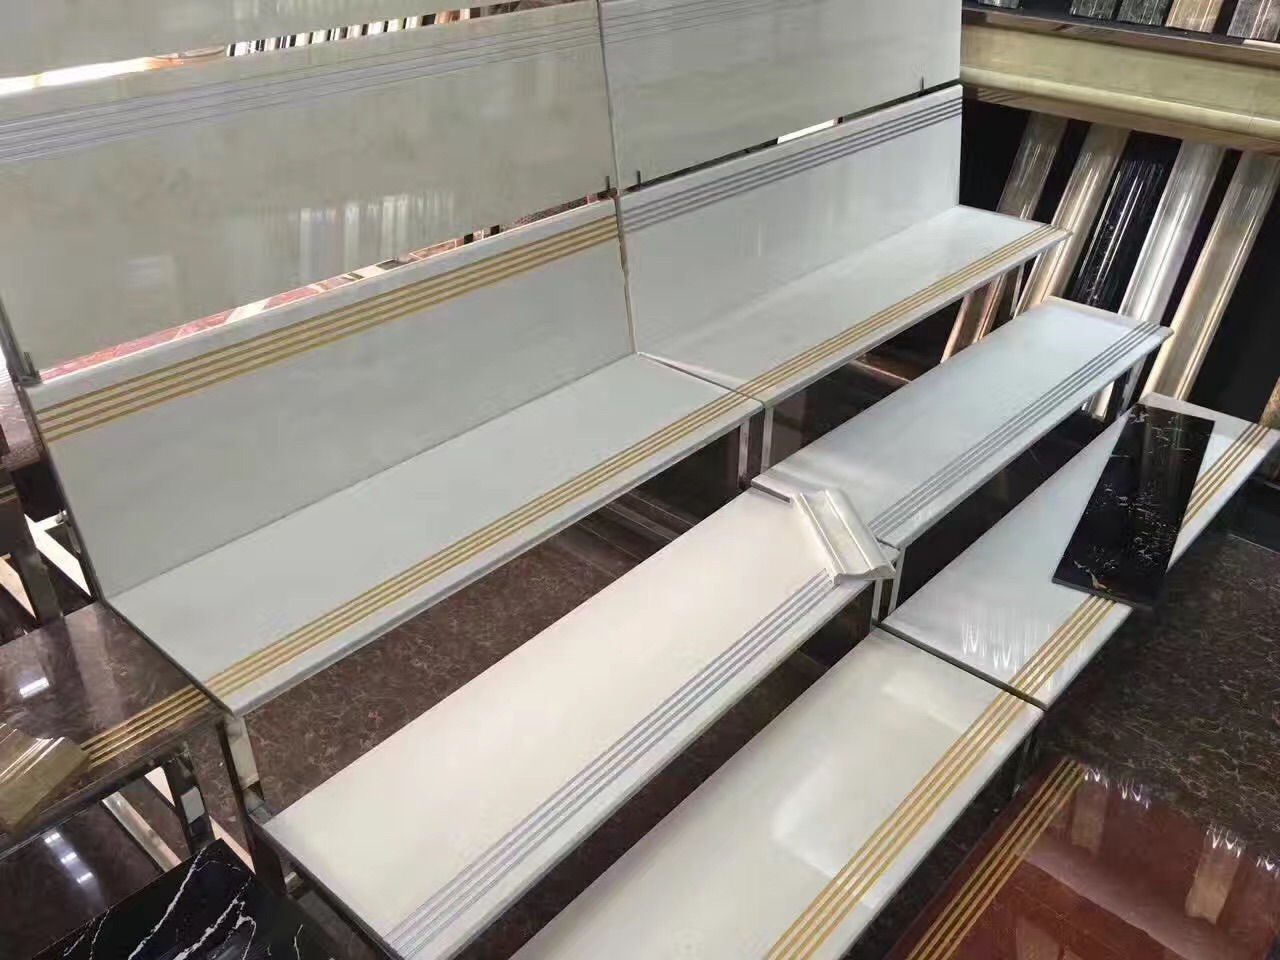 China supplier glazed polished porcelain stairs tile ceramic stair china supplier glazed polished porcelain stairs tile ceramic stair tiles china stair tile porcelain stair tile dailygadgetfo Images